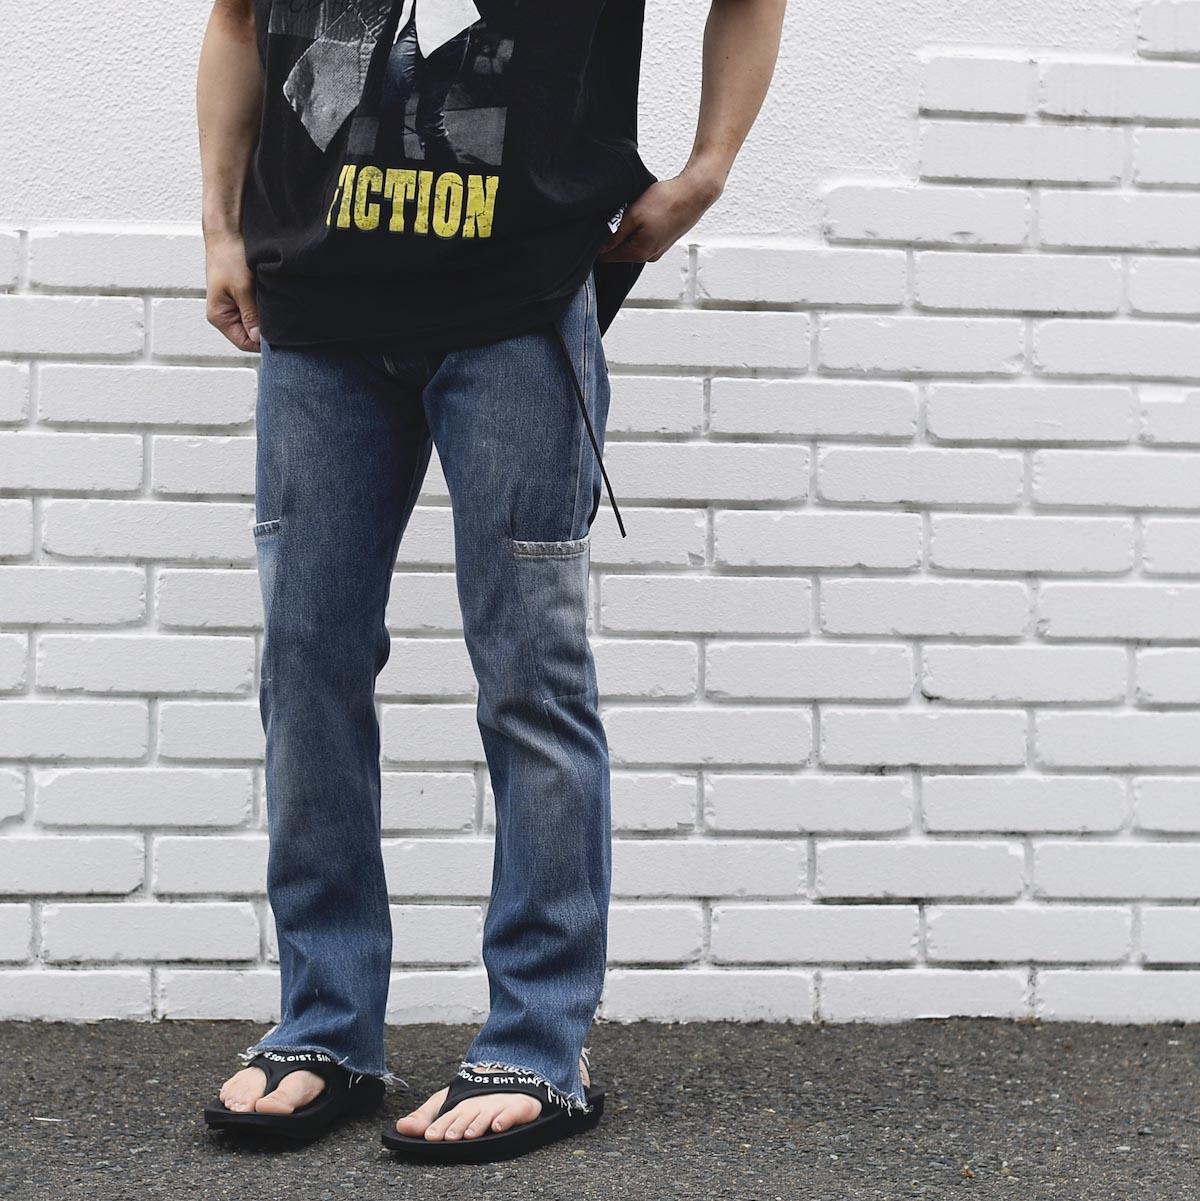 OLD PARK / 7Pocket Jeans -Blue着用例① (162cm / Ssize着用)